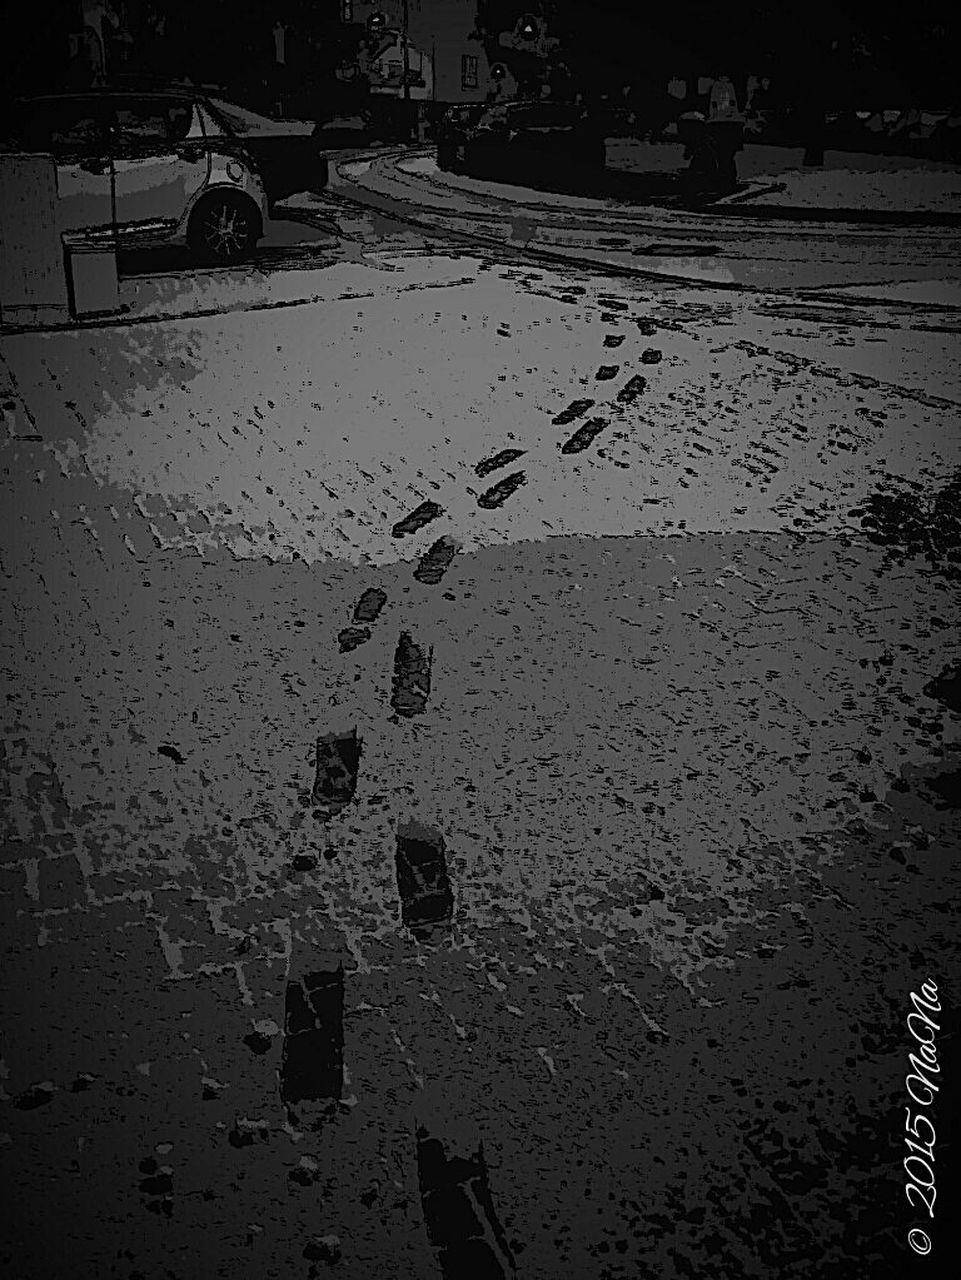 sand, footprint, beach, outdoors, no people, night, nature, sky